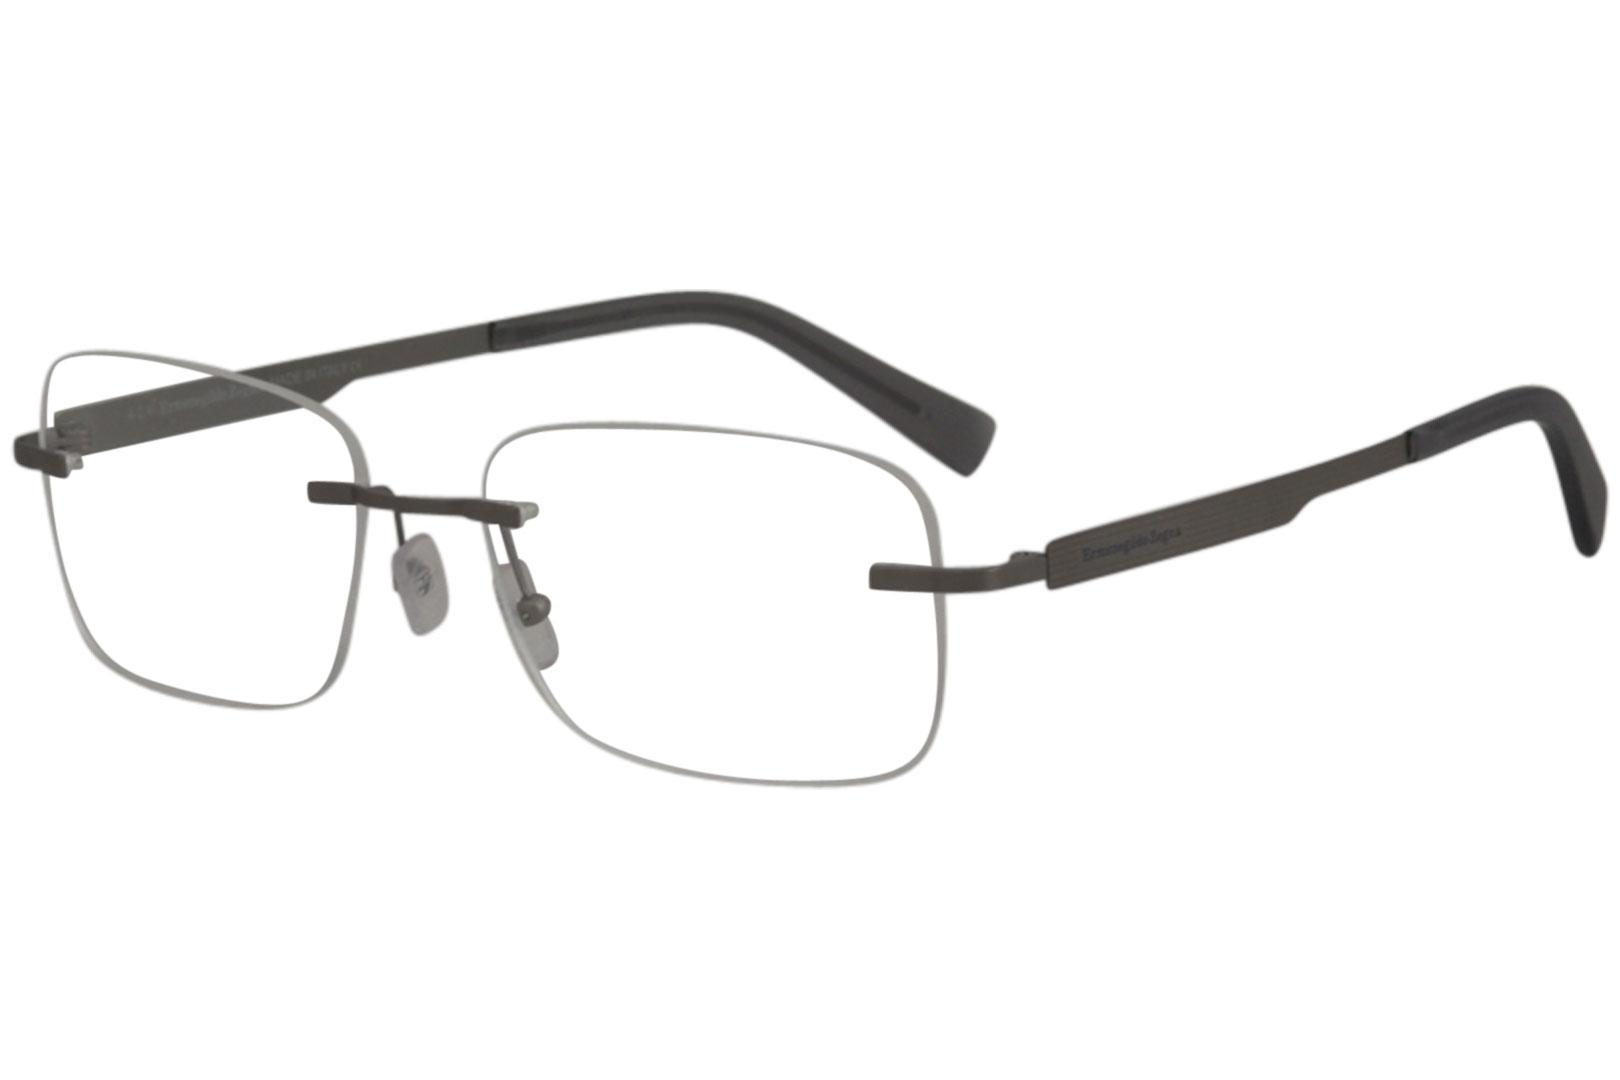 d66fcdf2c4d Ermenegildo Zegna Men s Eyeglasses EZ5026 EZ 5026 Rimless Optical Frame